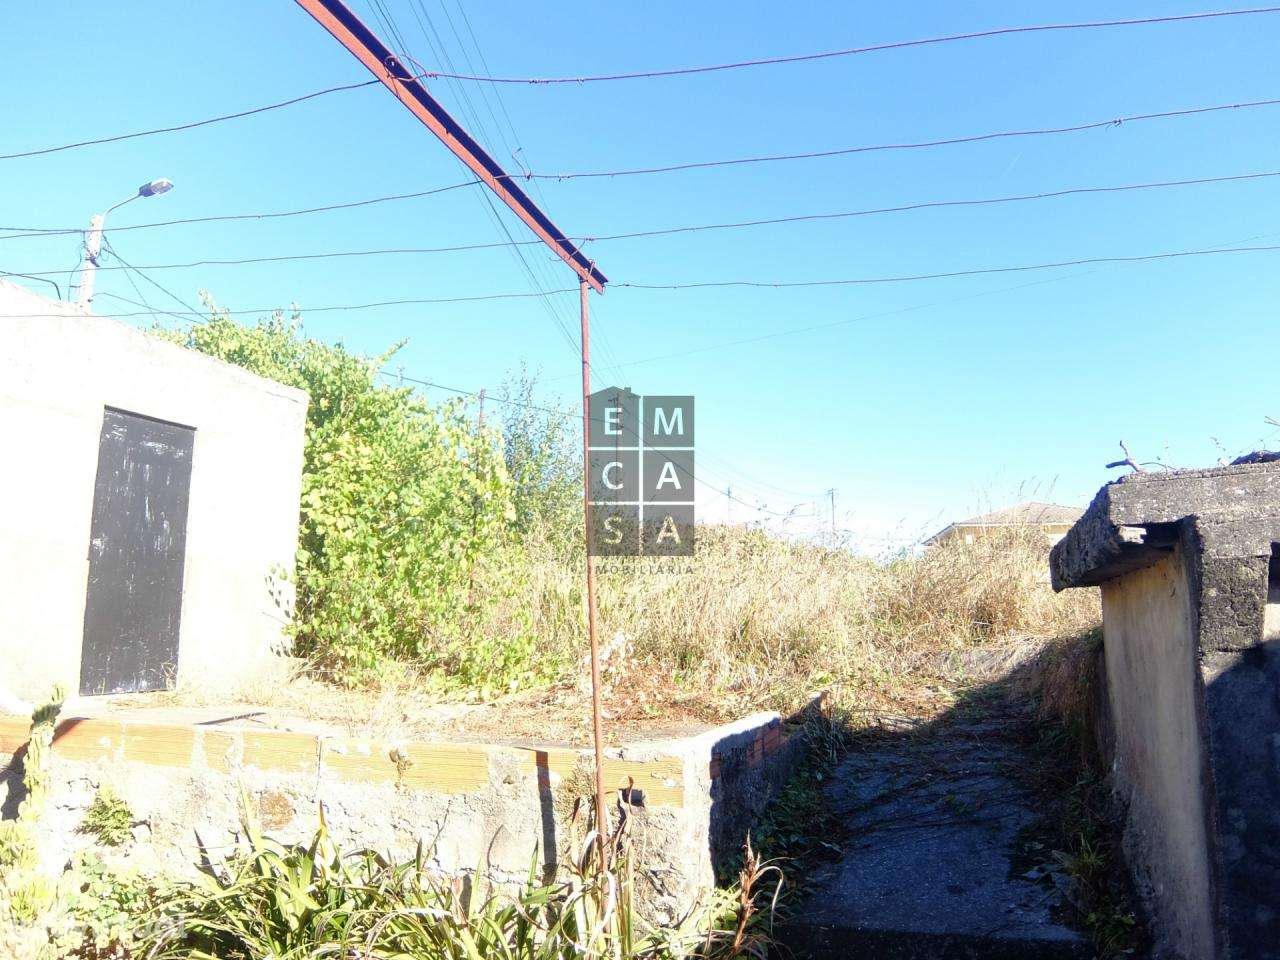 Moradia para comprar, Oliveira de Azeméis, Santiago de Riba-Ul, Ul, Macinhata da Seixa e Madail, Oliveira de Azeméis, Aveiro - Foto 19